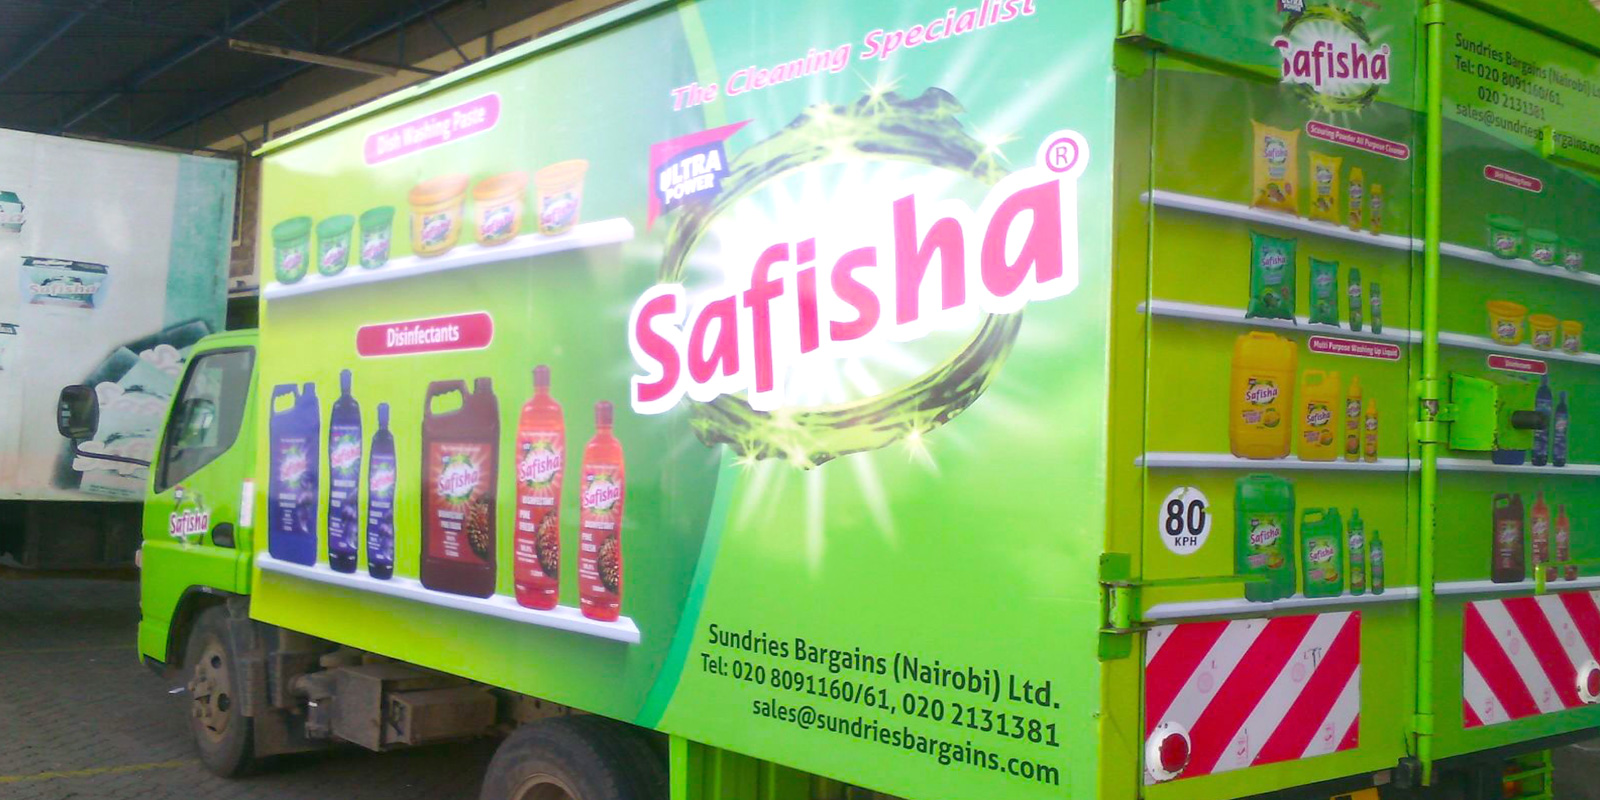 safisha-truck-branding-4